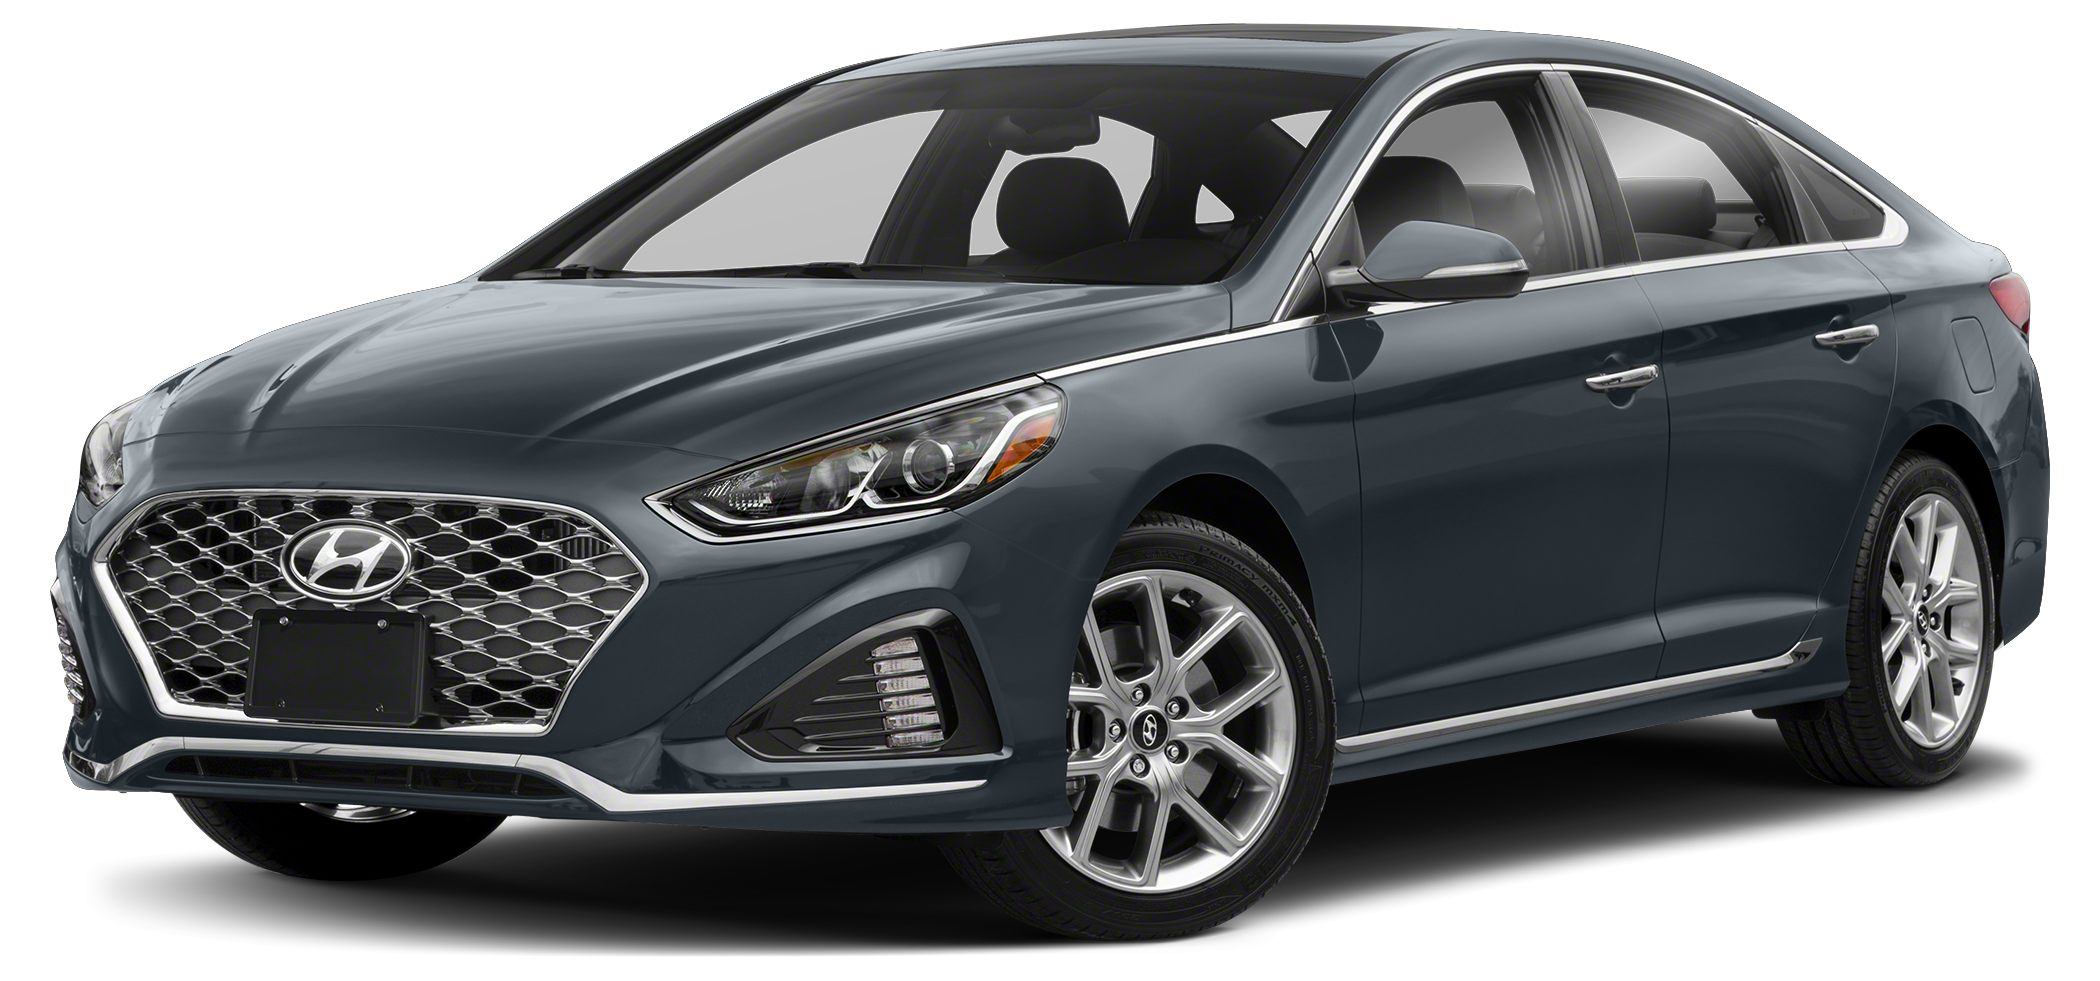 2018 Hyundai Sonata Sport 20T 20L Turbo Gasoline Direct Injection 4-Cylinder Engine Blue Link